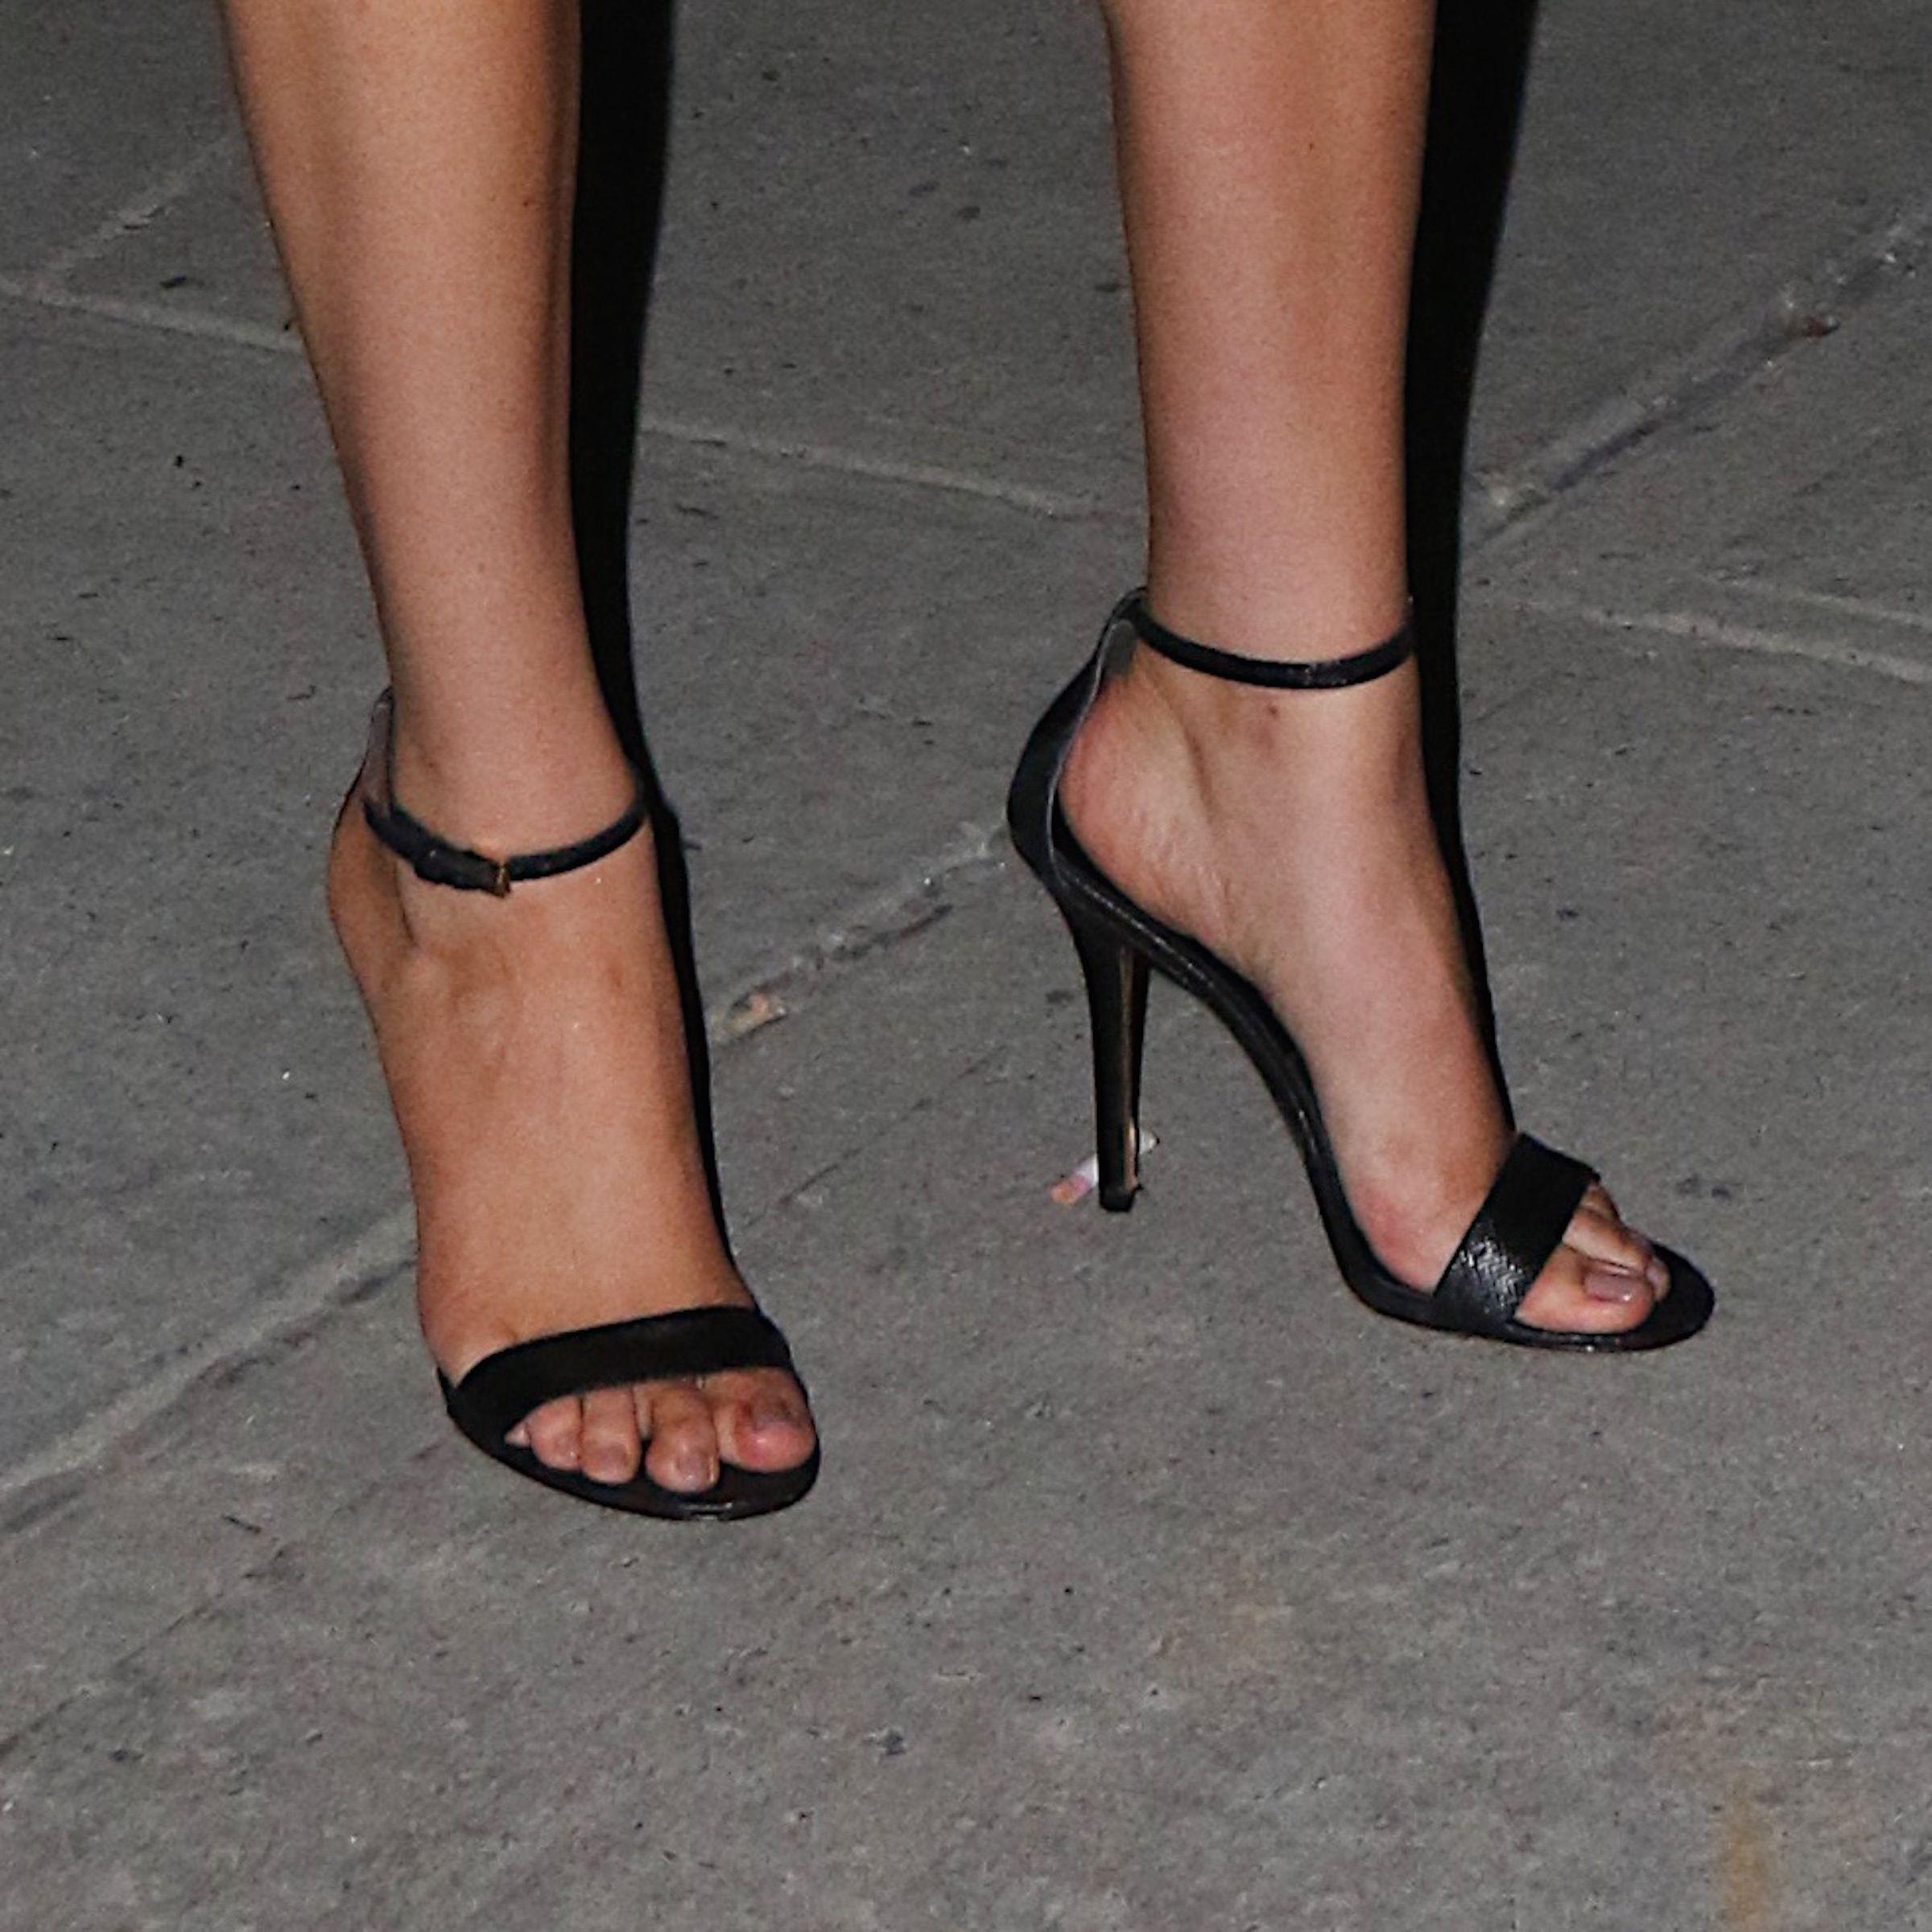 Kate uptons feet wikifeet ladies shoes pinterest celebrity kate uptons feet wikifeet altavistaventures Choice Image